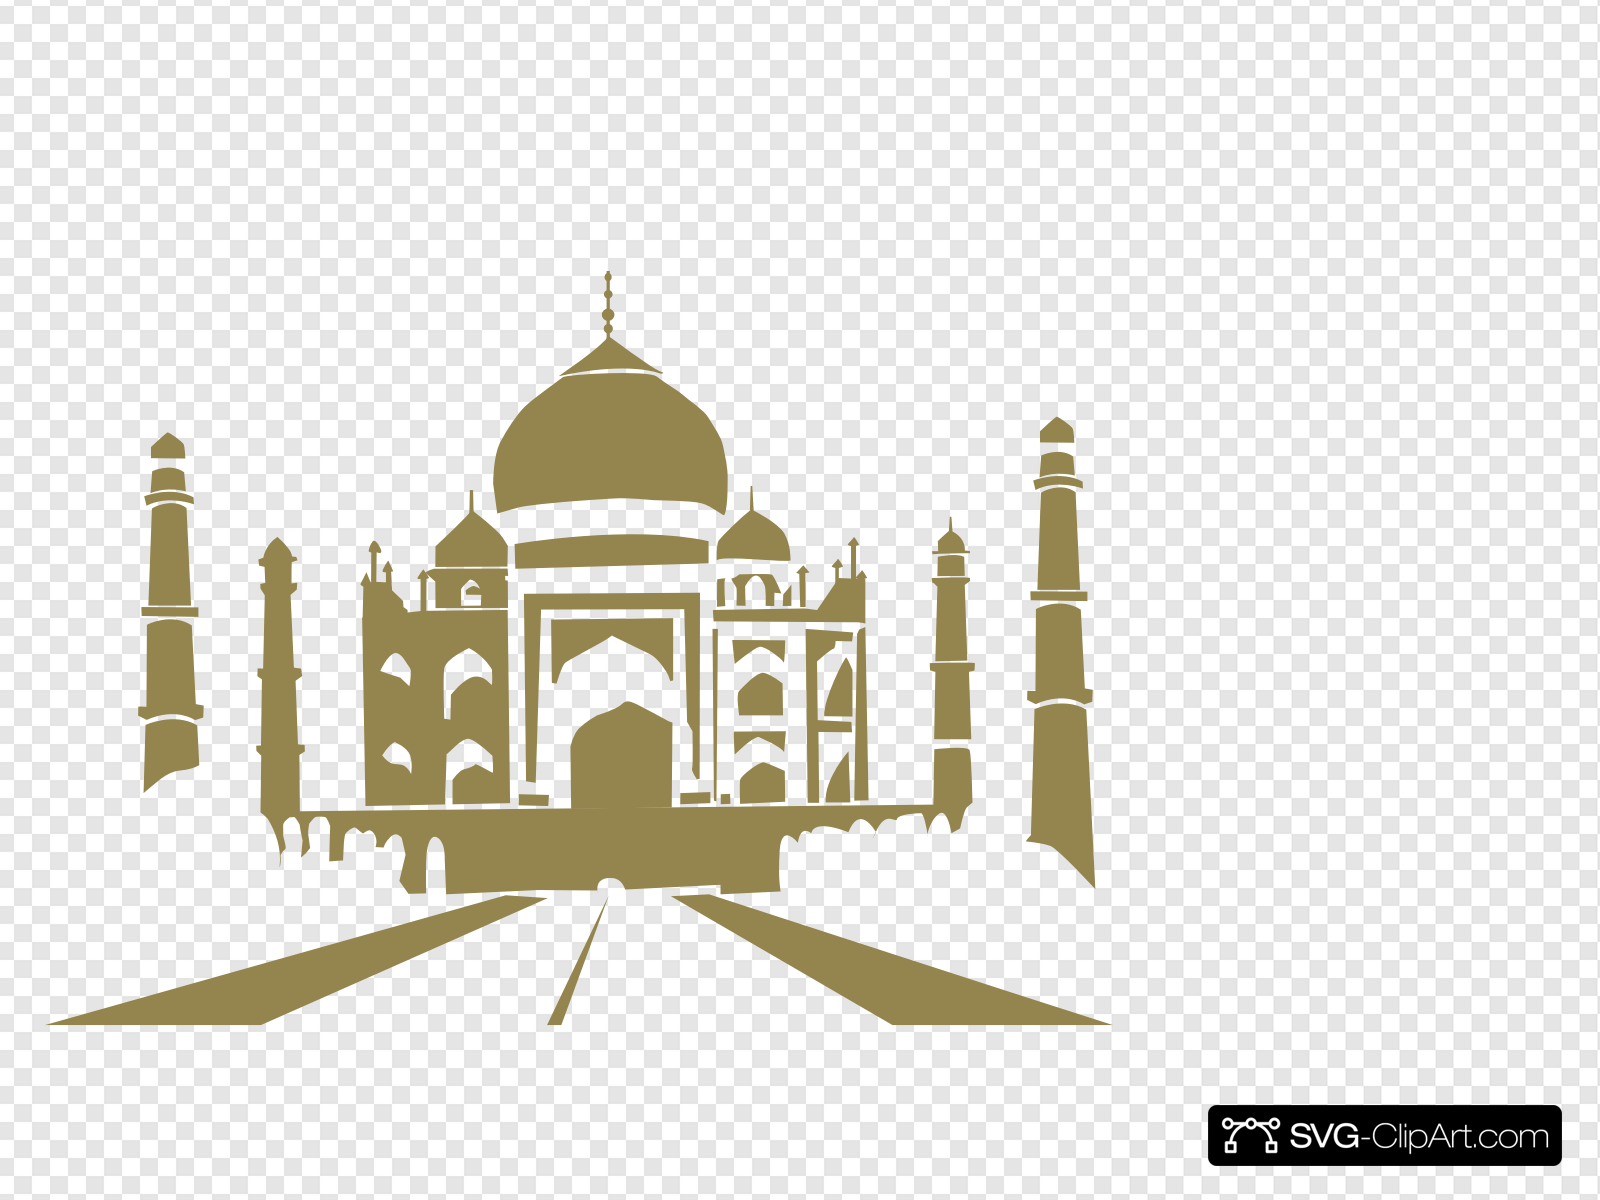 Taj clipart banner transparent library Taj Mahal Roti Prata Clip art, Icon and SVG - SVG Clipart banner transparent library